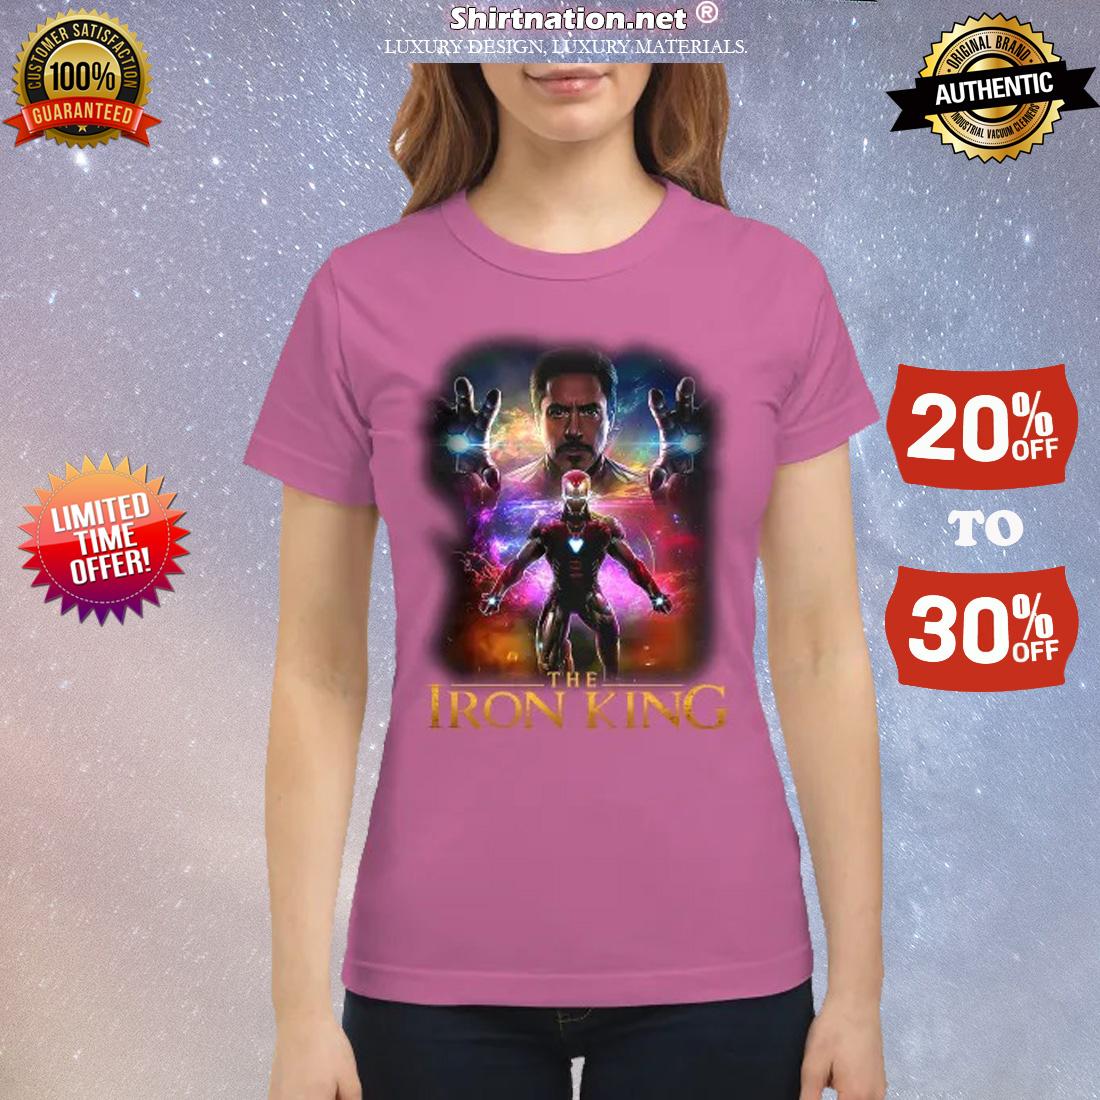 Iron man the iron king classic shirt